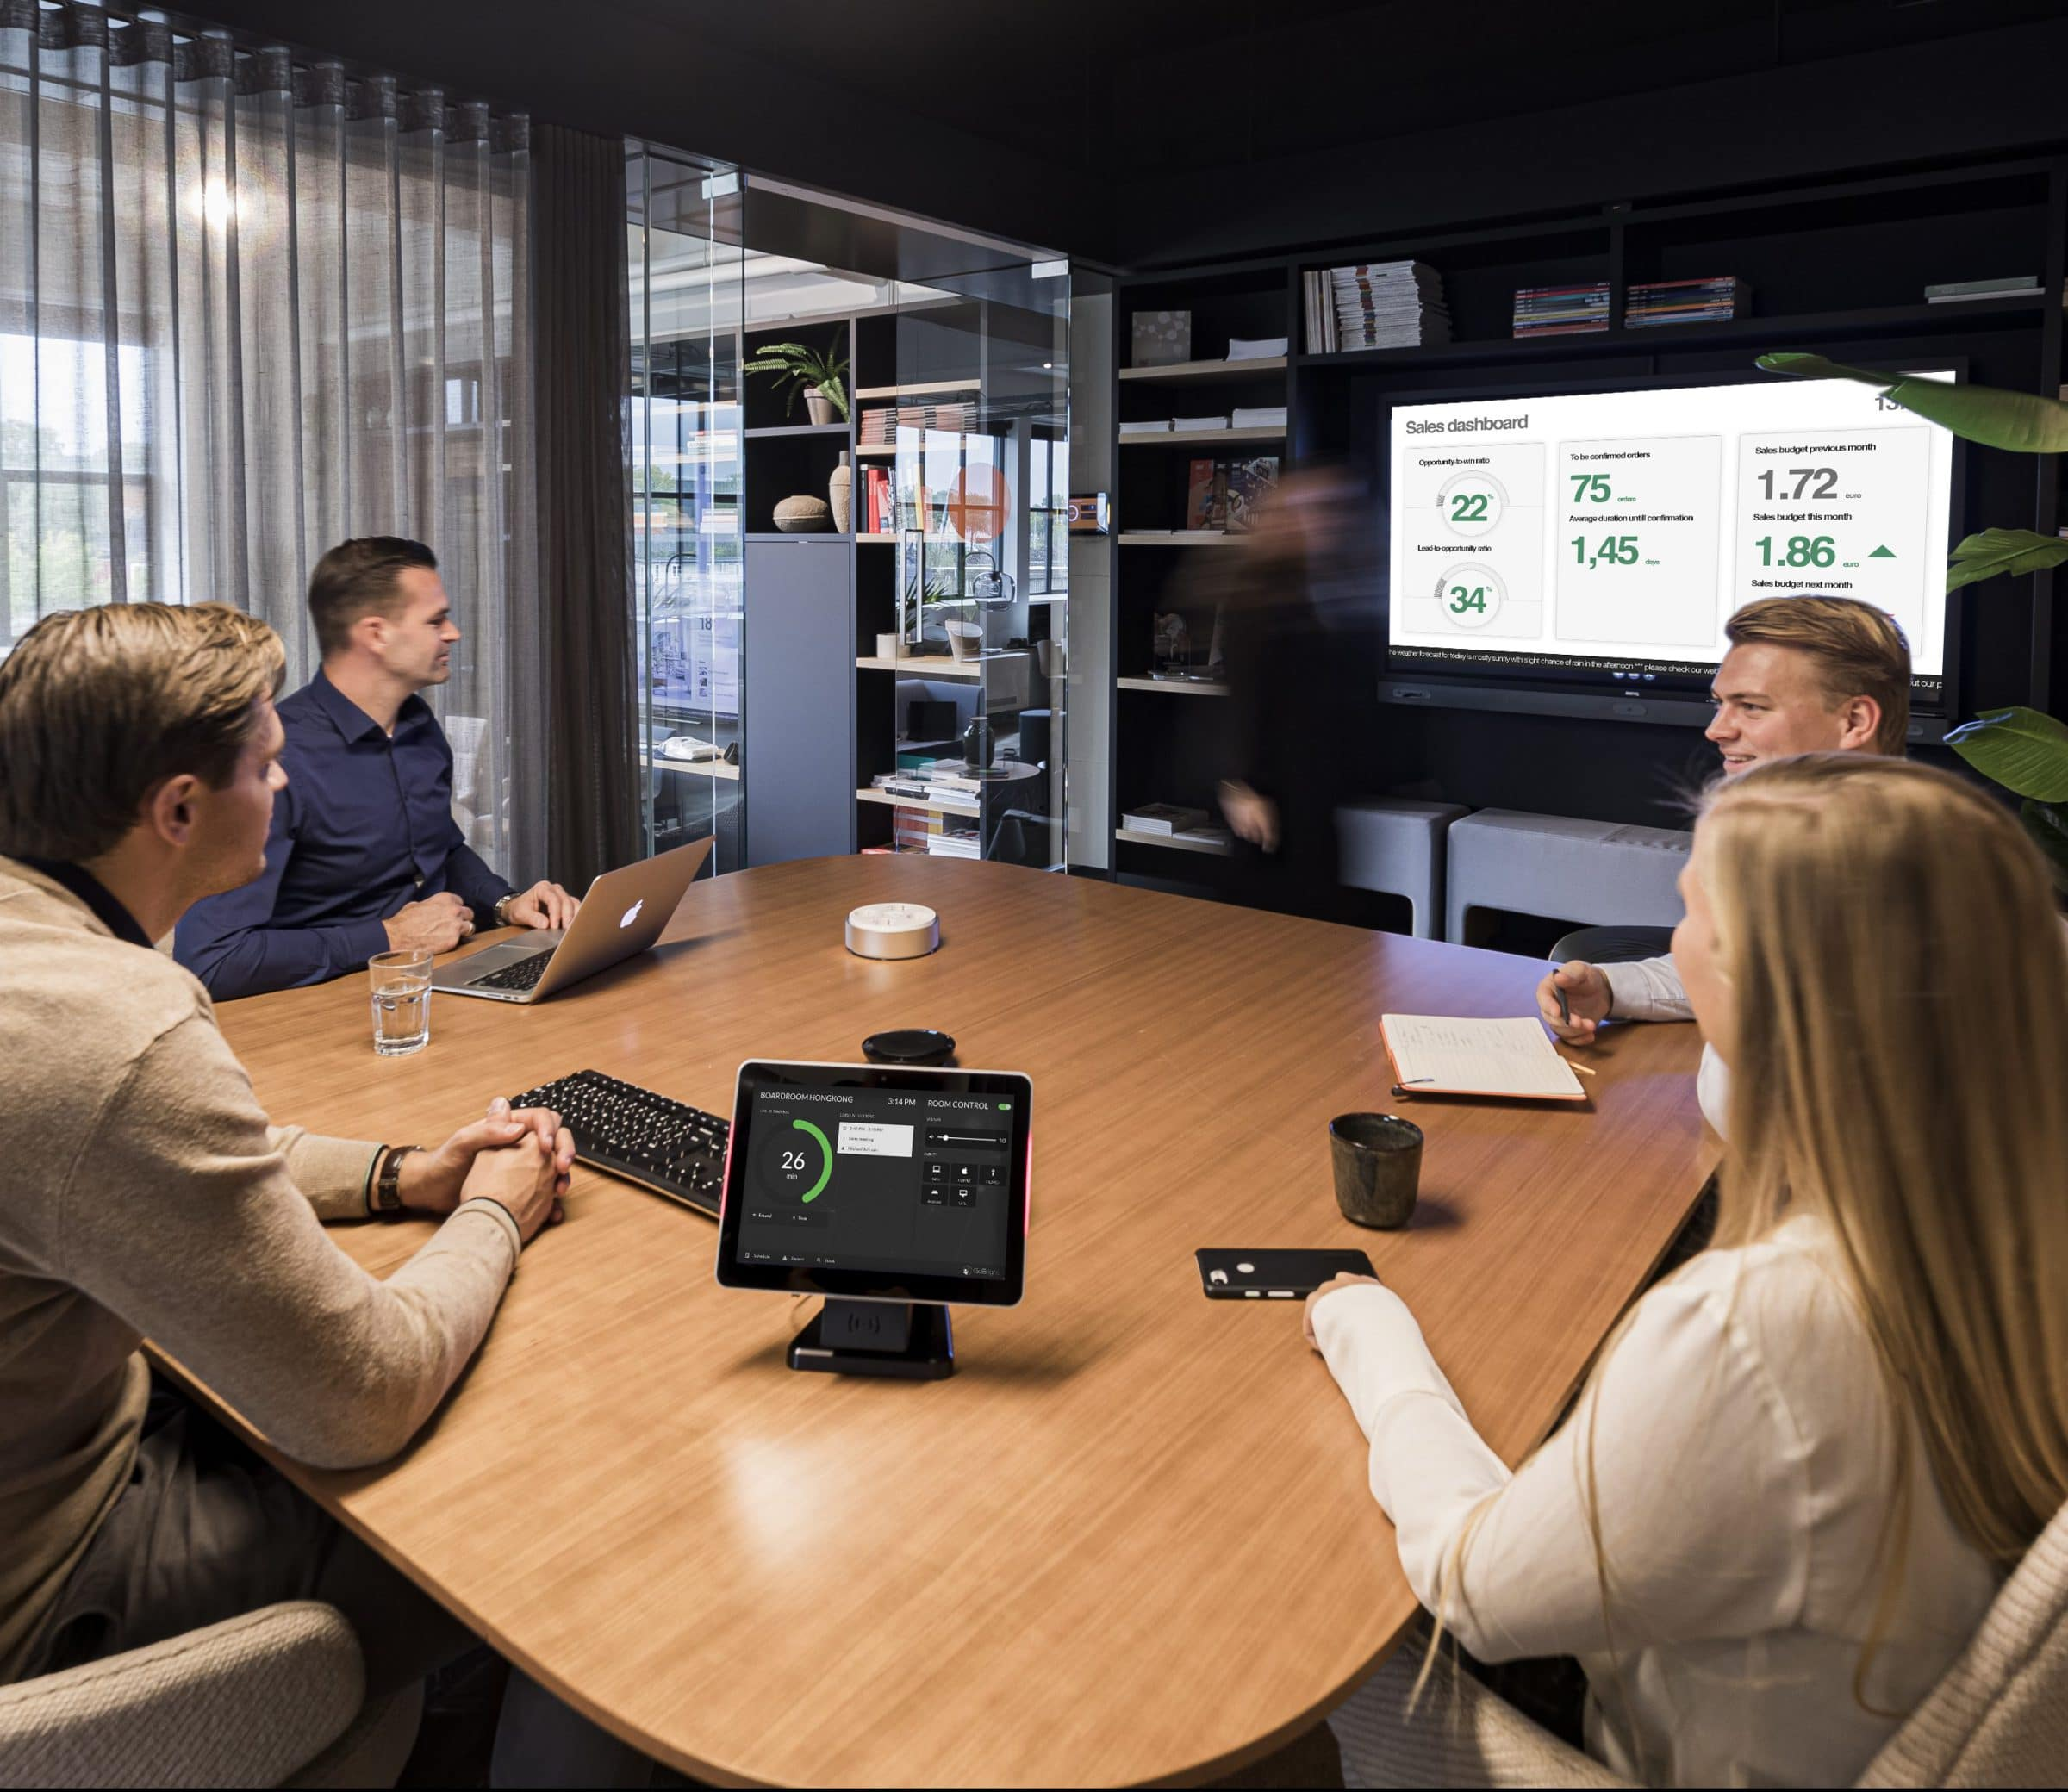 GoBright View - Digital Signage - Narrowcasting - software solutions